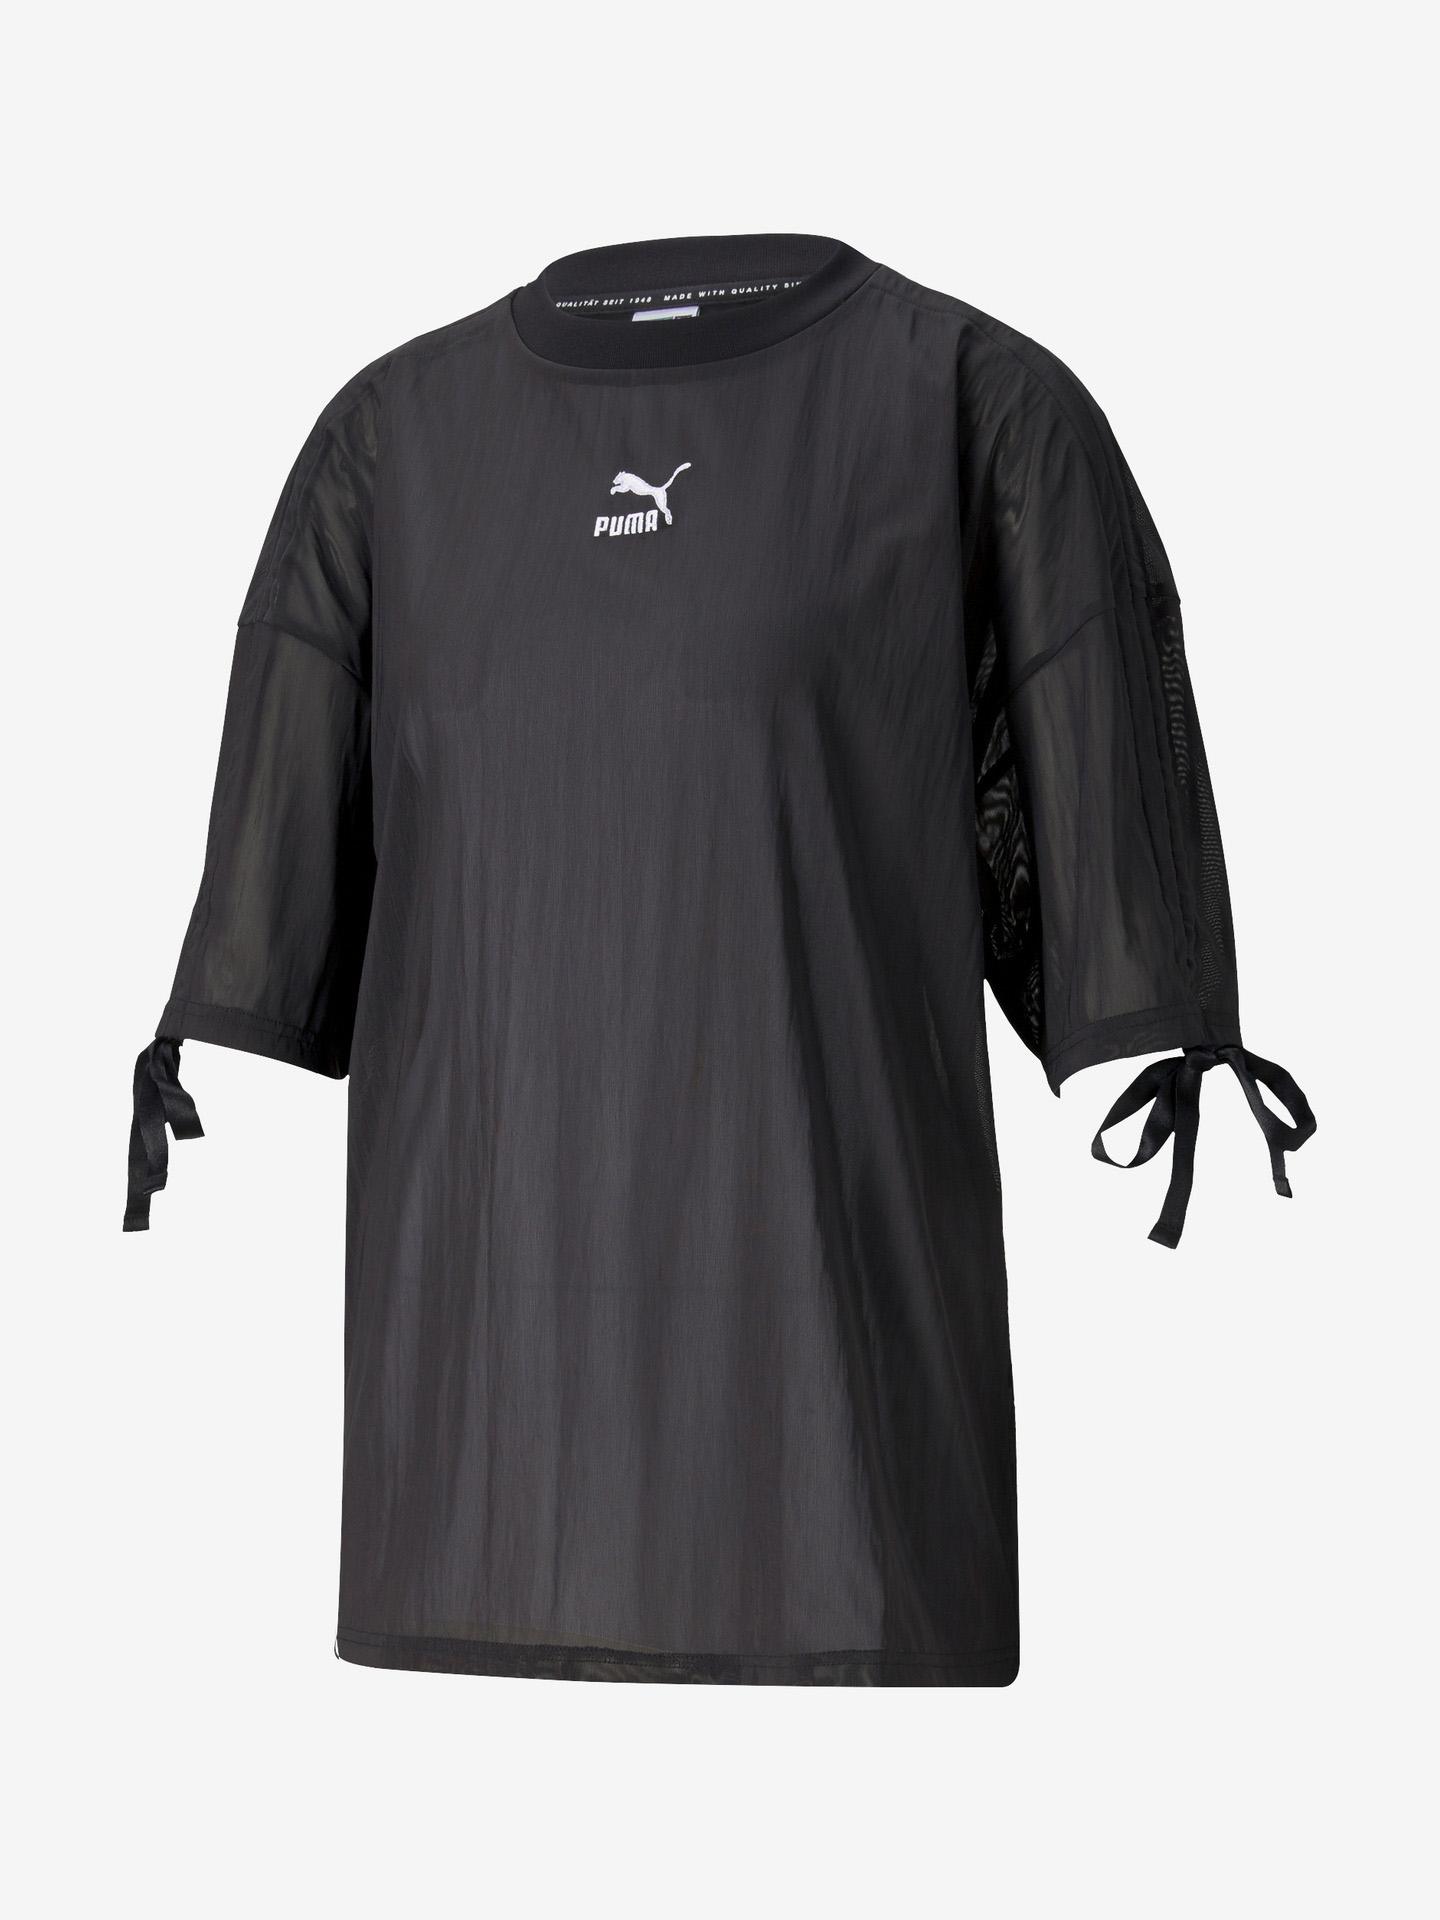 Puma PBAE T-shirt Black